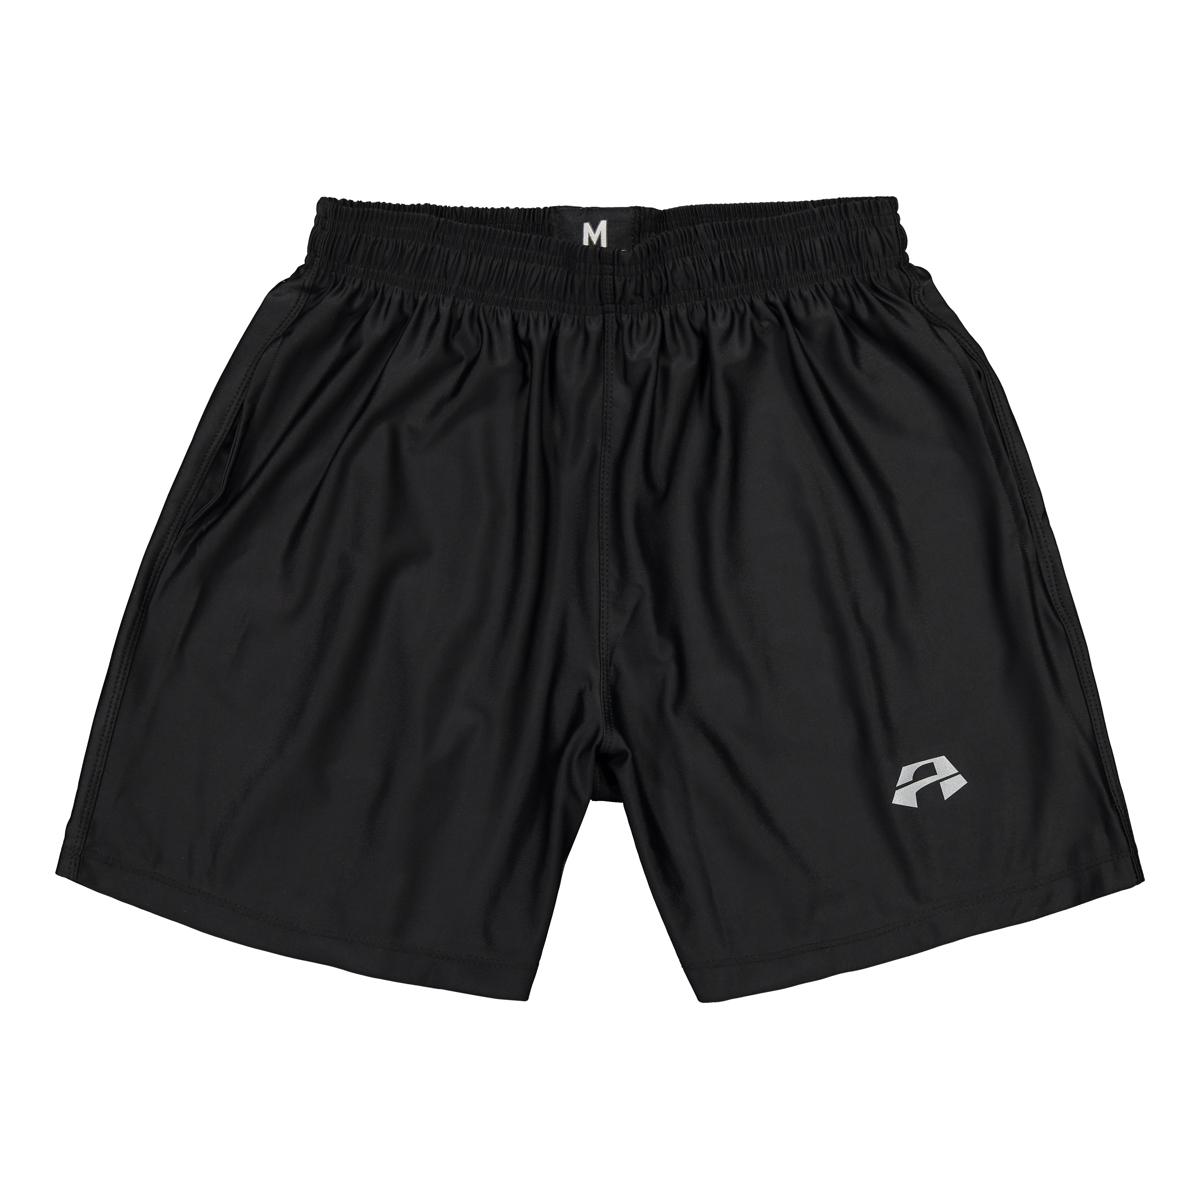 Elite² Shorts